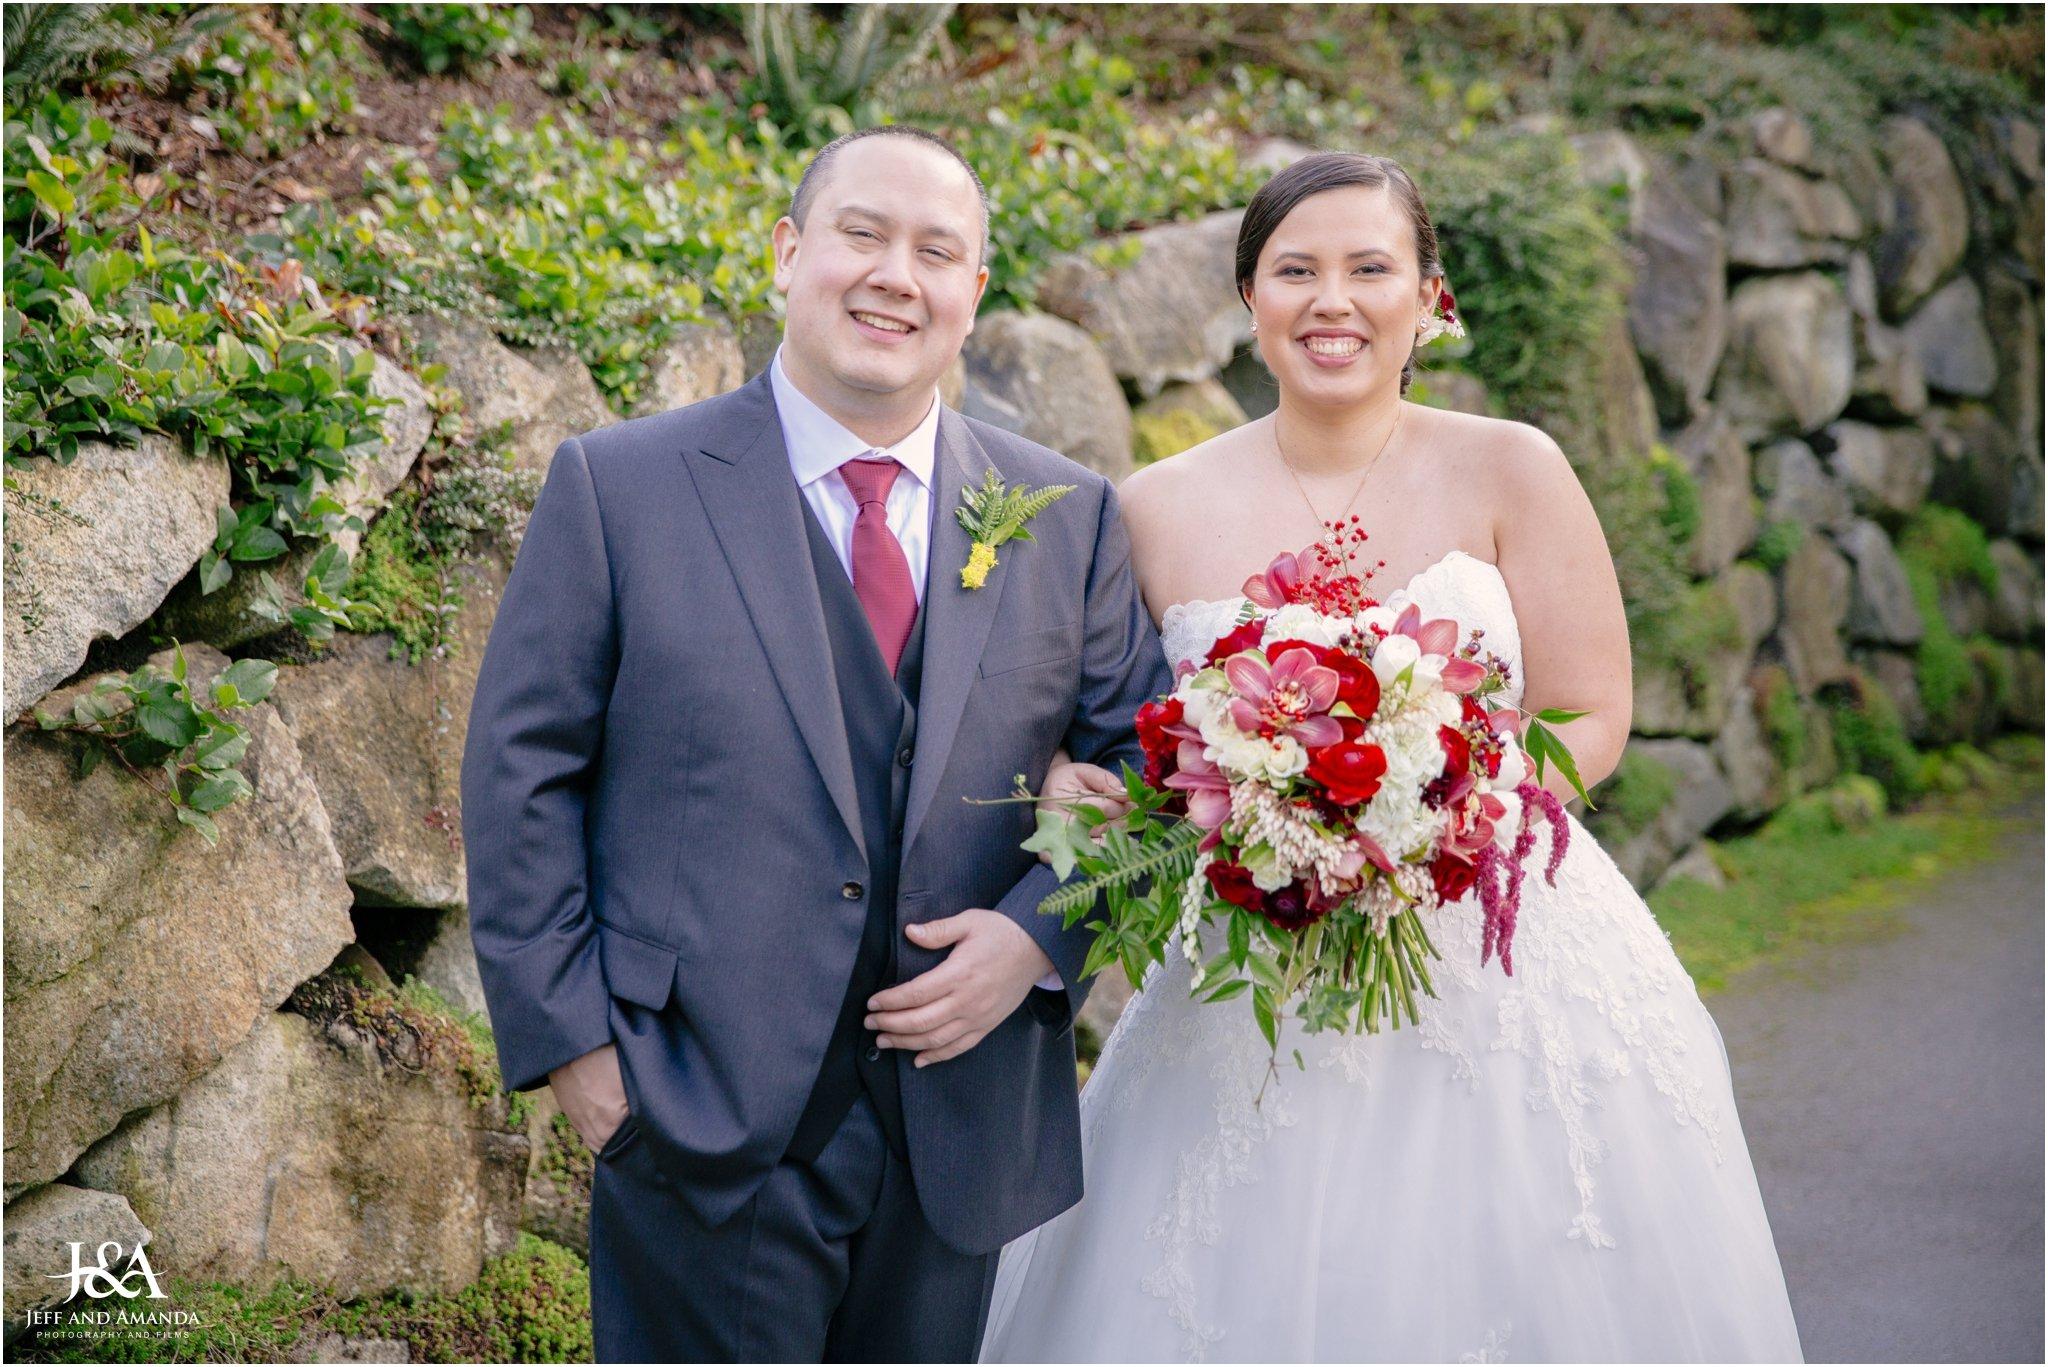 Dave and Kari s Wedding-Facebook Ready-0274.jpg